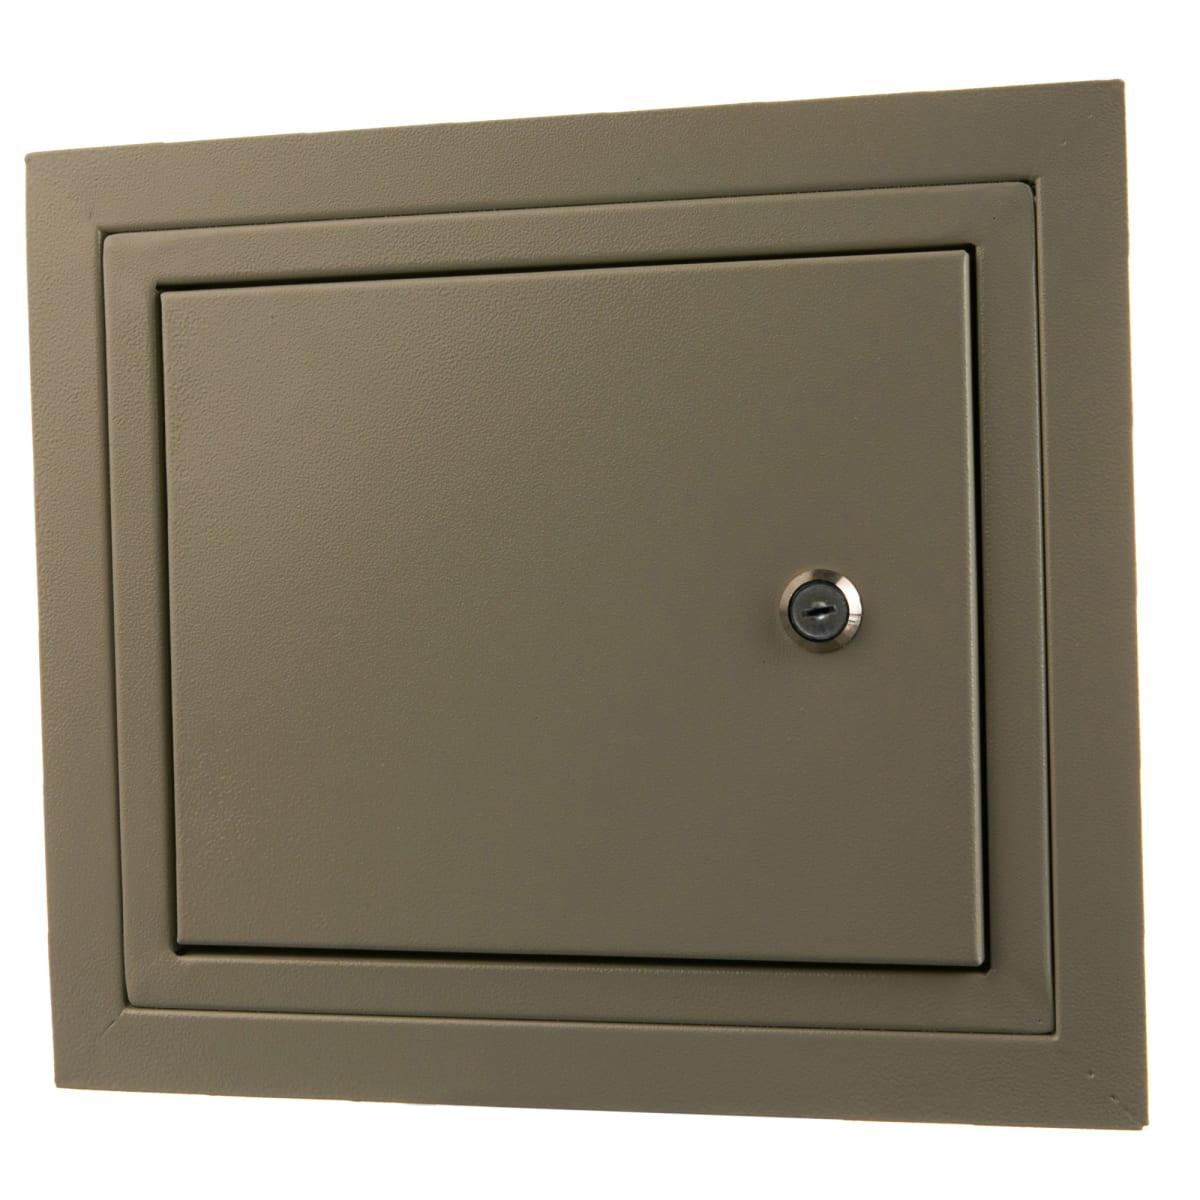 Щит металлический МЭК ЩРв-9, 275х320х120